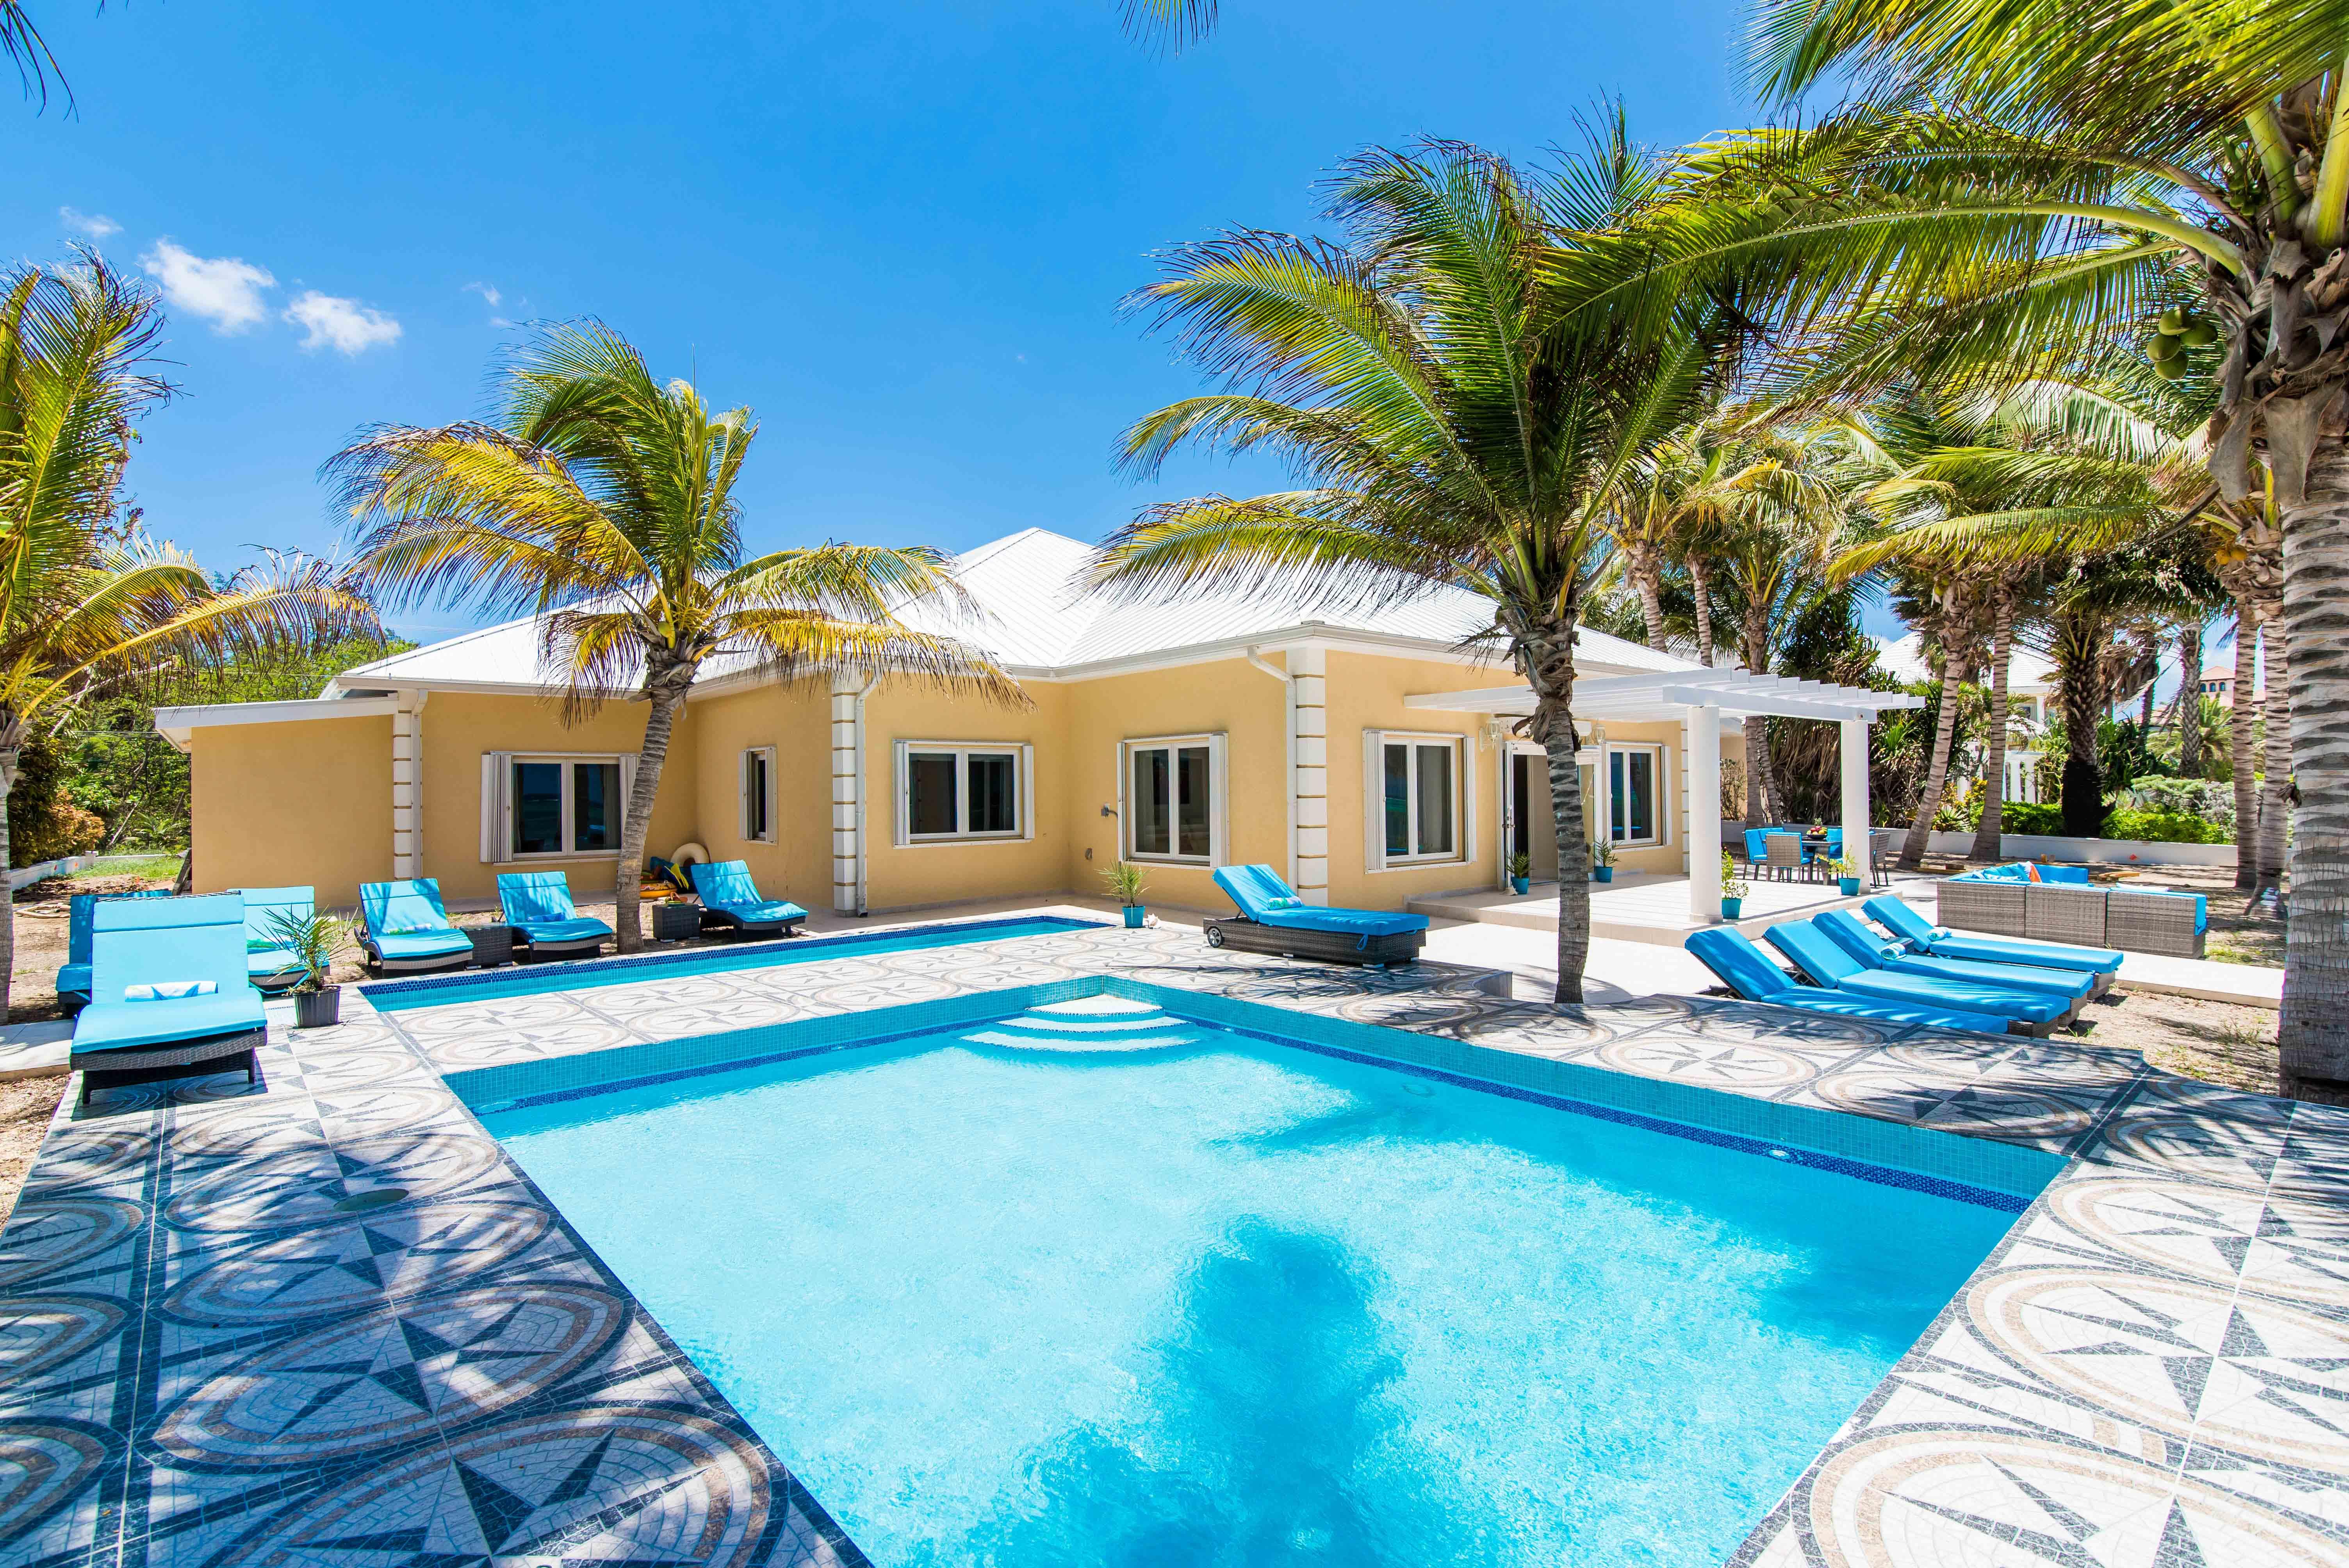 Sprat Bay Pool and Villa